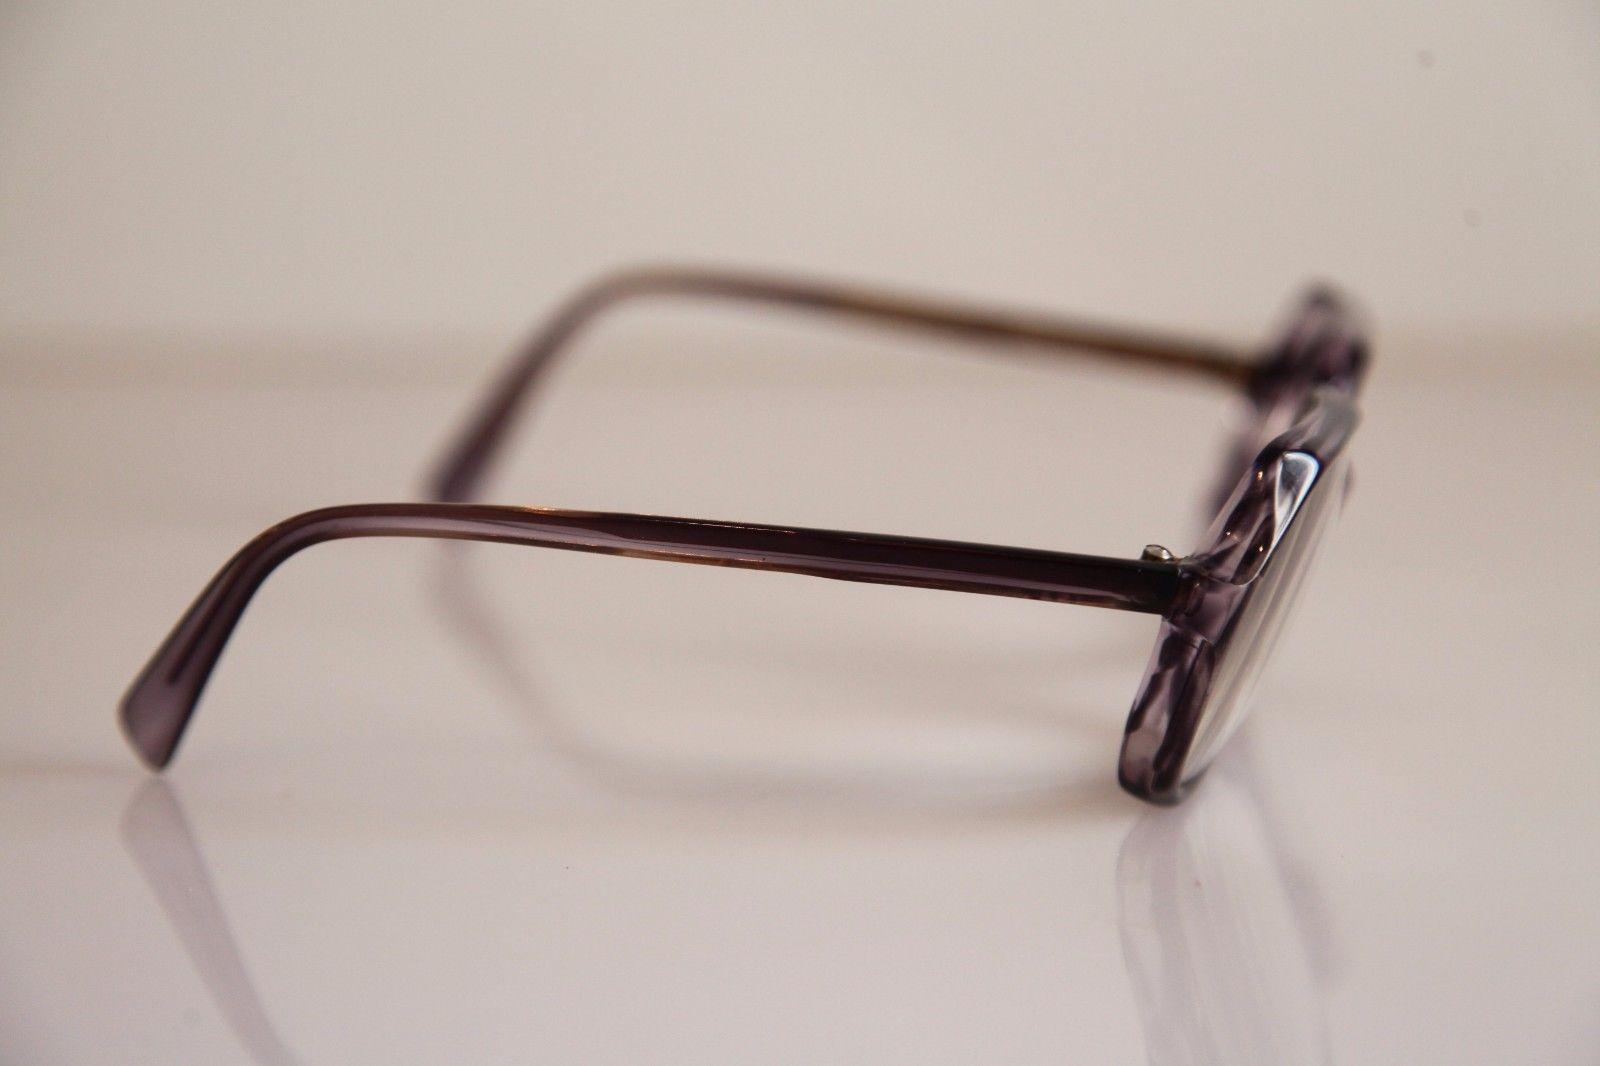 HARGA EVA Eyewear, Crystal Deep Purple Frame, RX-Able Prescription lens. FRANCE image 5